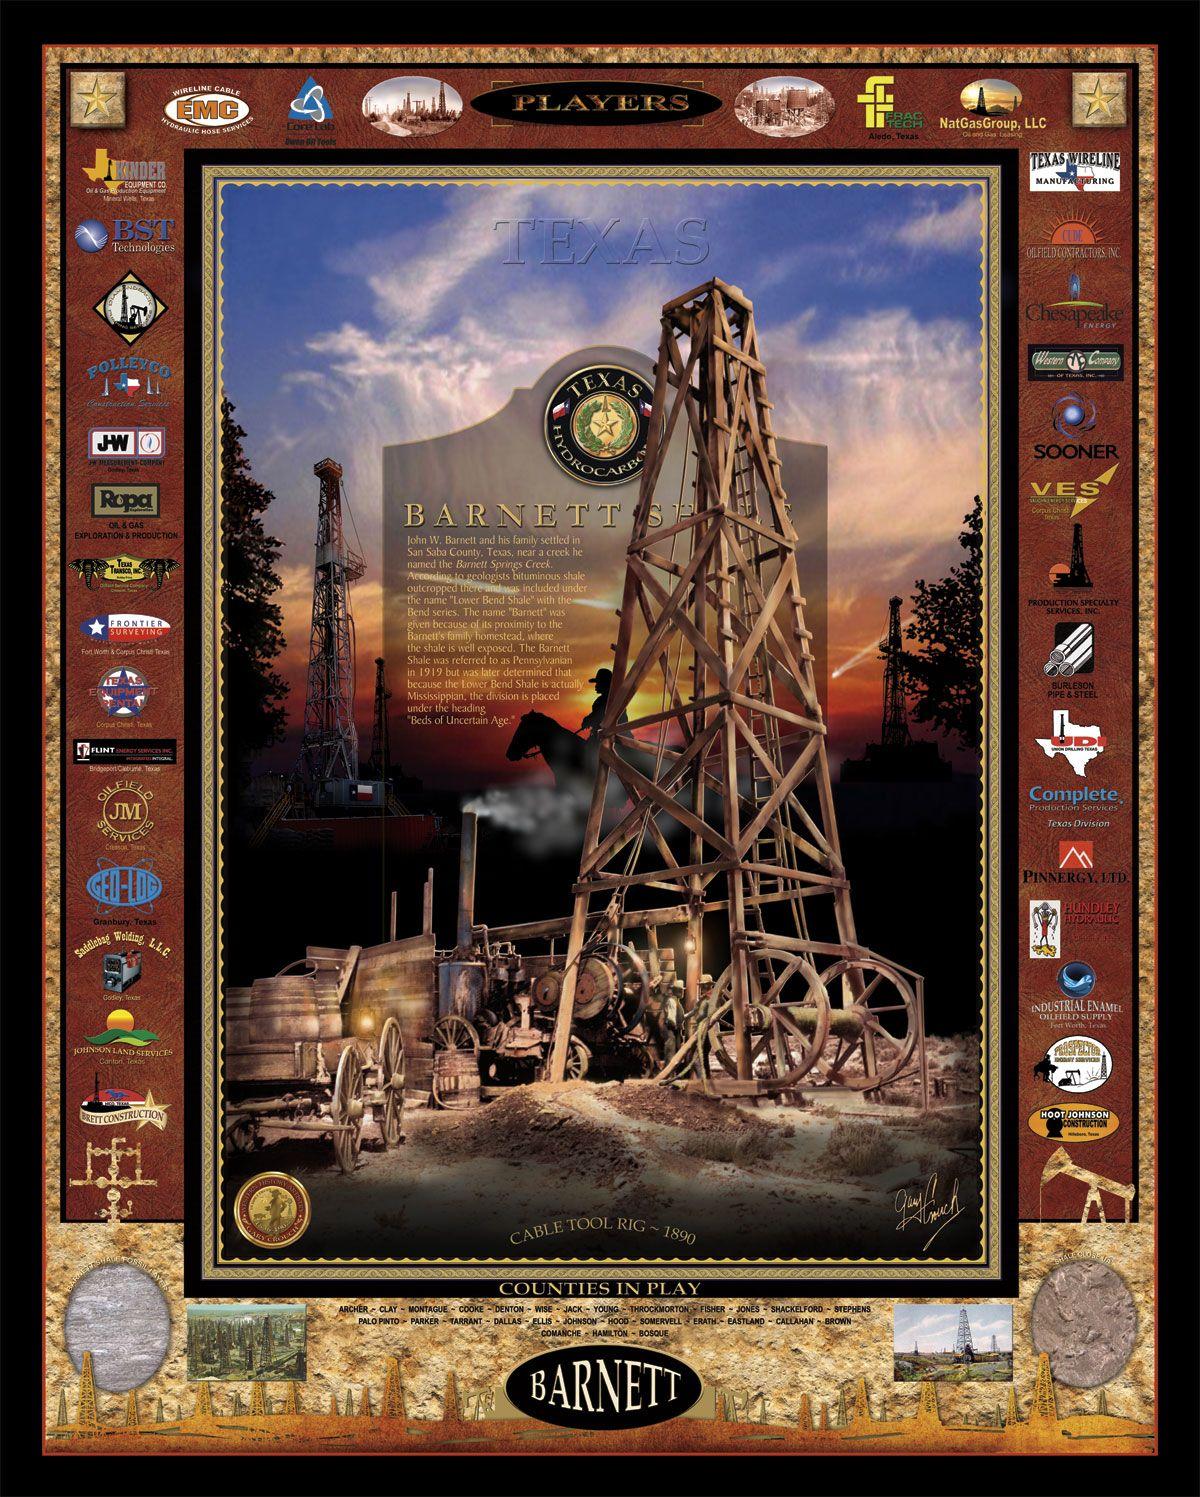 BARNETT | Travel Old America | Oil, gas, Art, Republic of texas